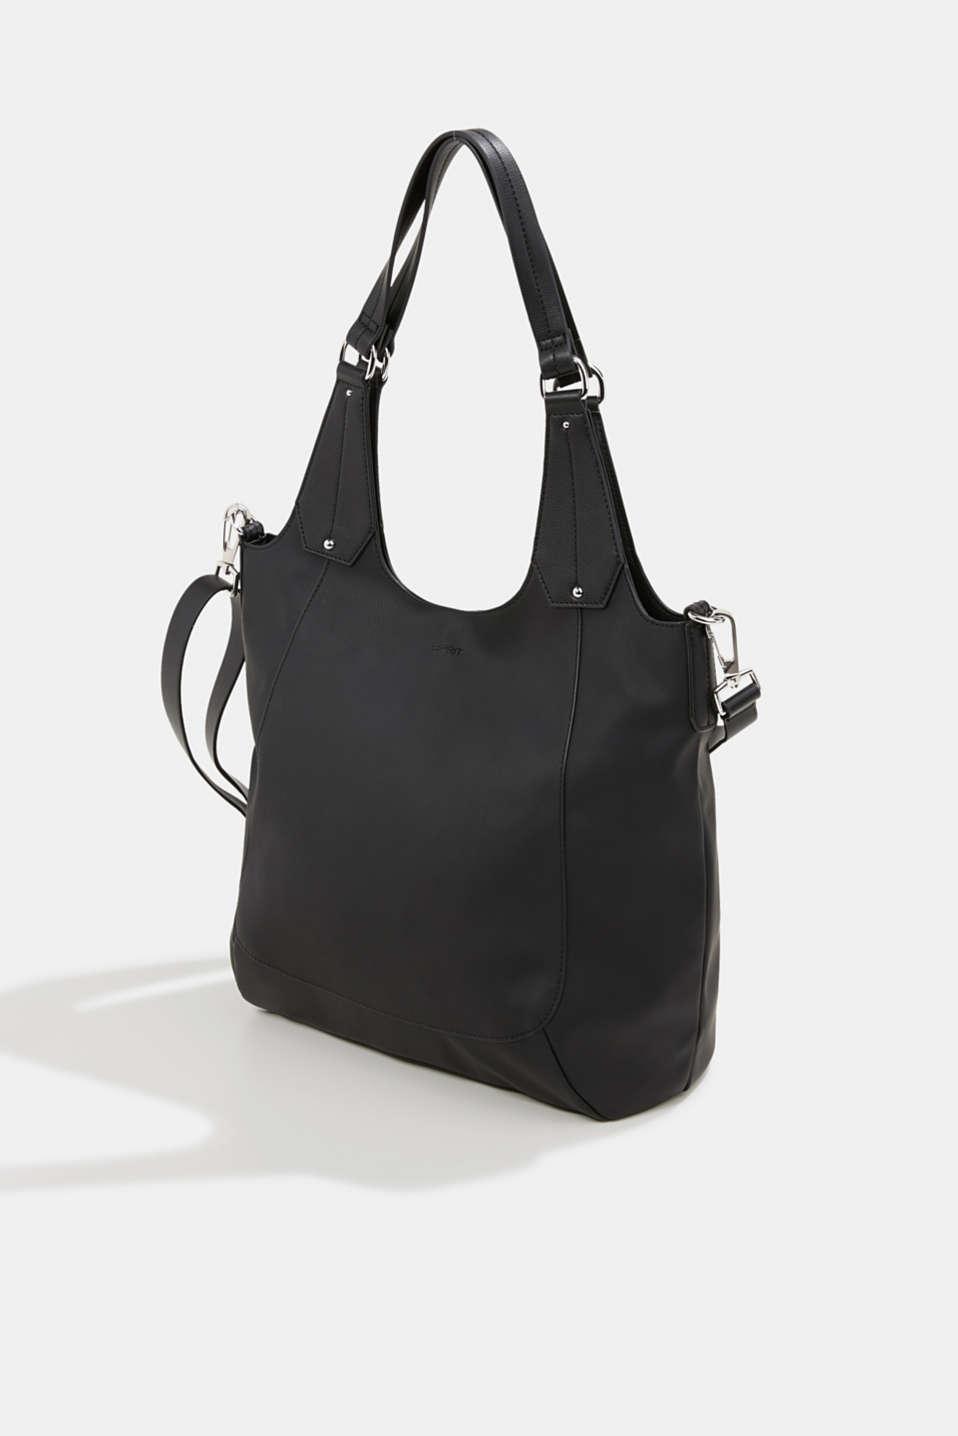 XL shopper in faux leather, vegan, BLACK, detail image number 2